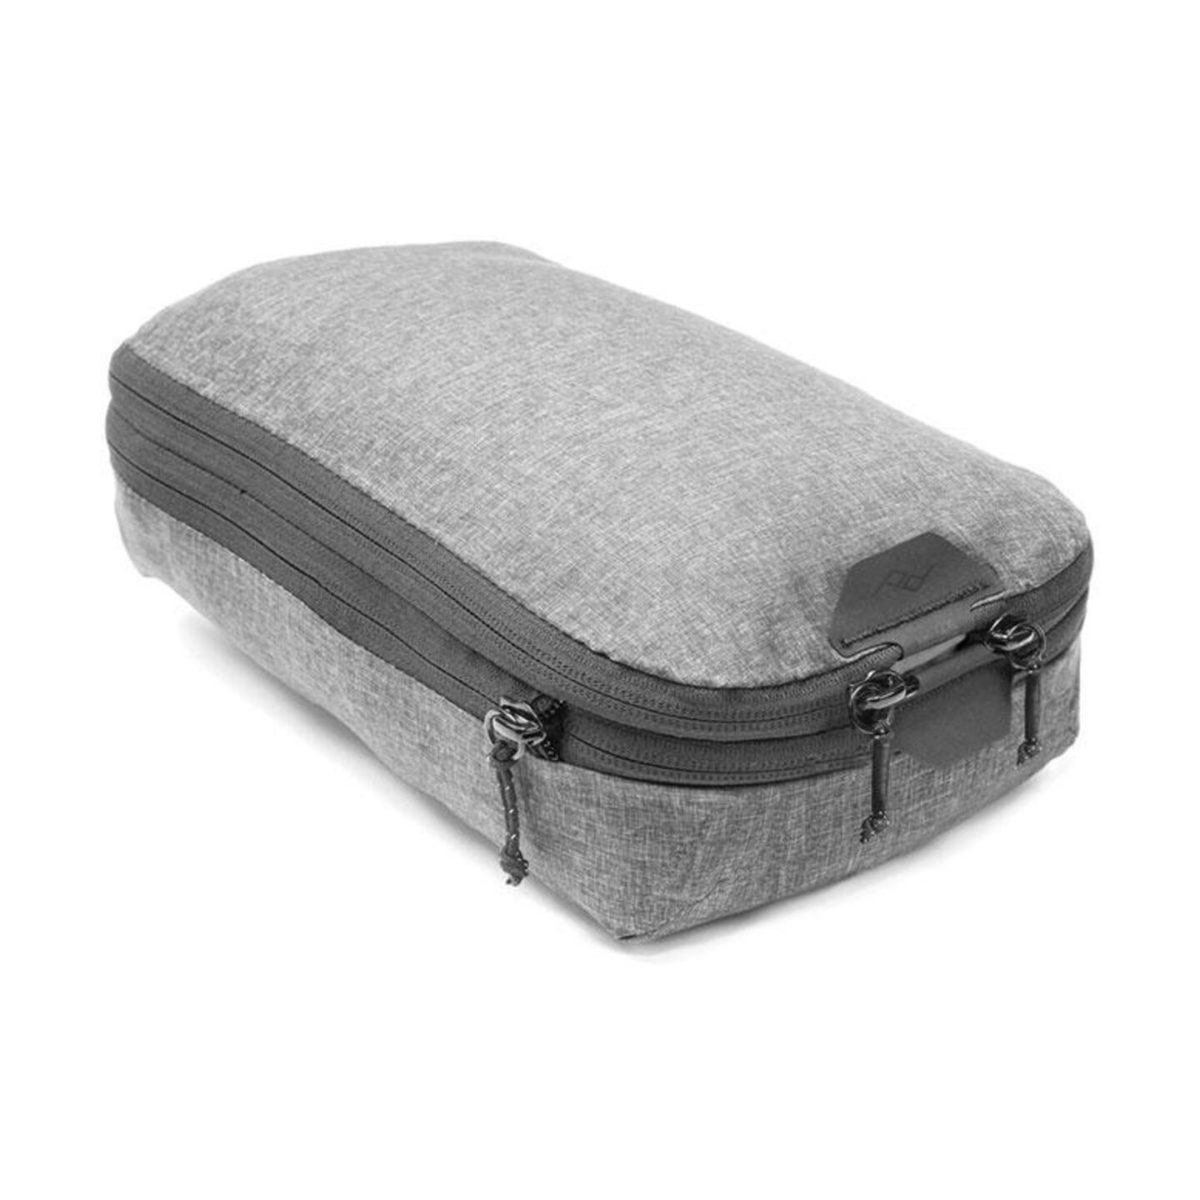 peak_design_packing_cube_small_01